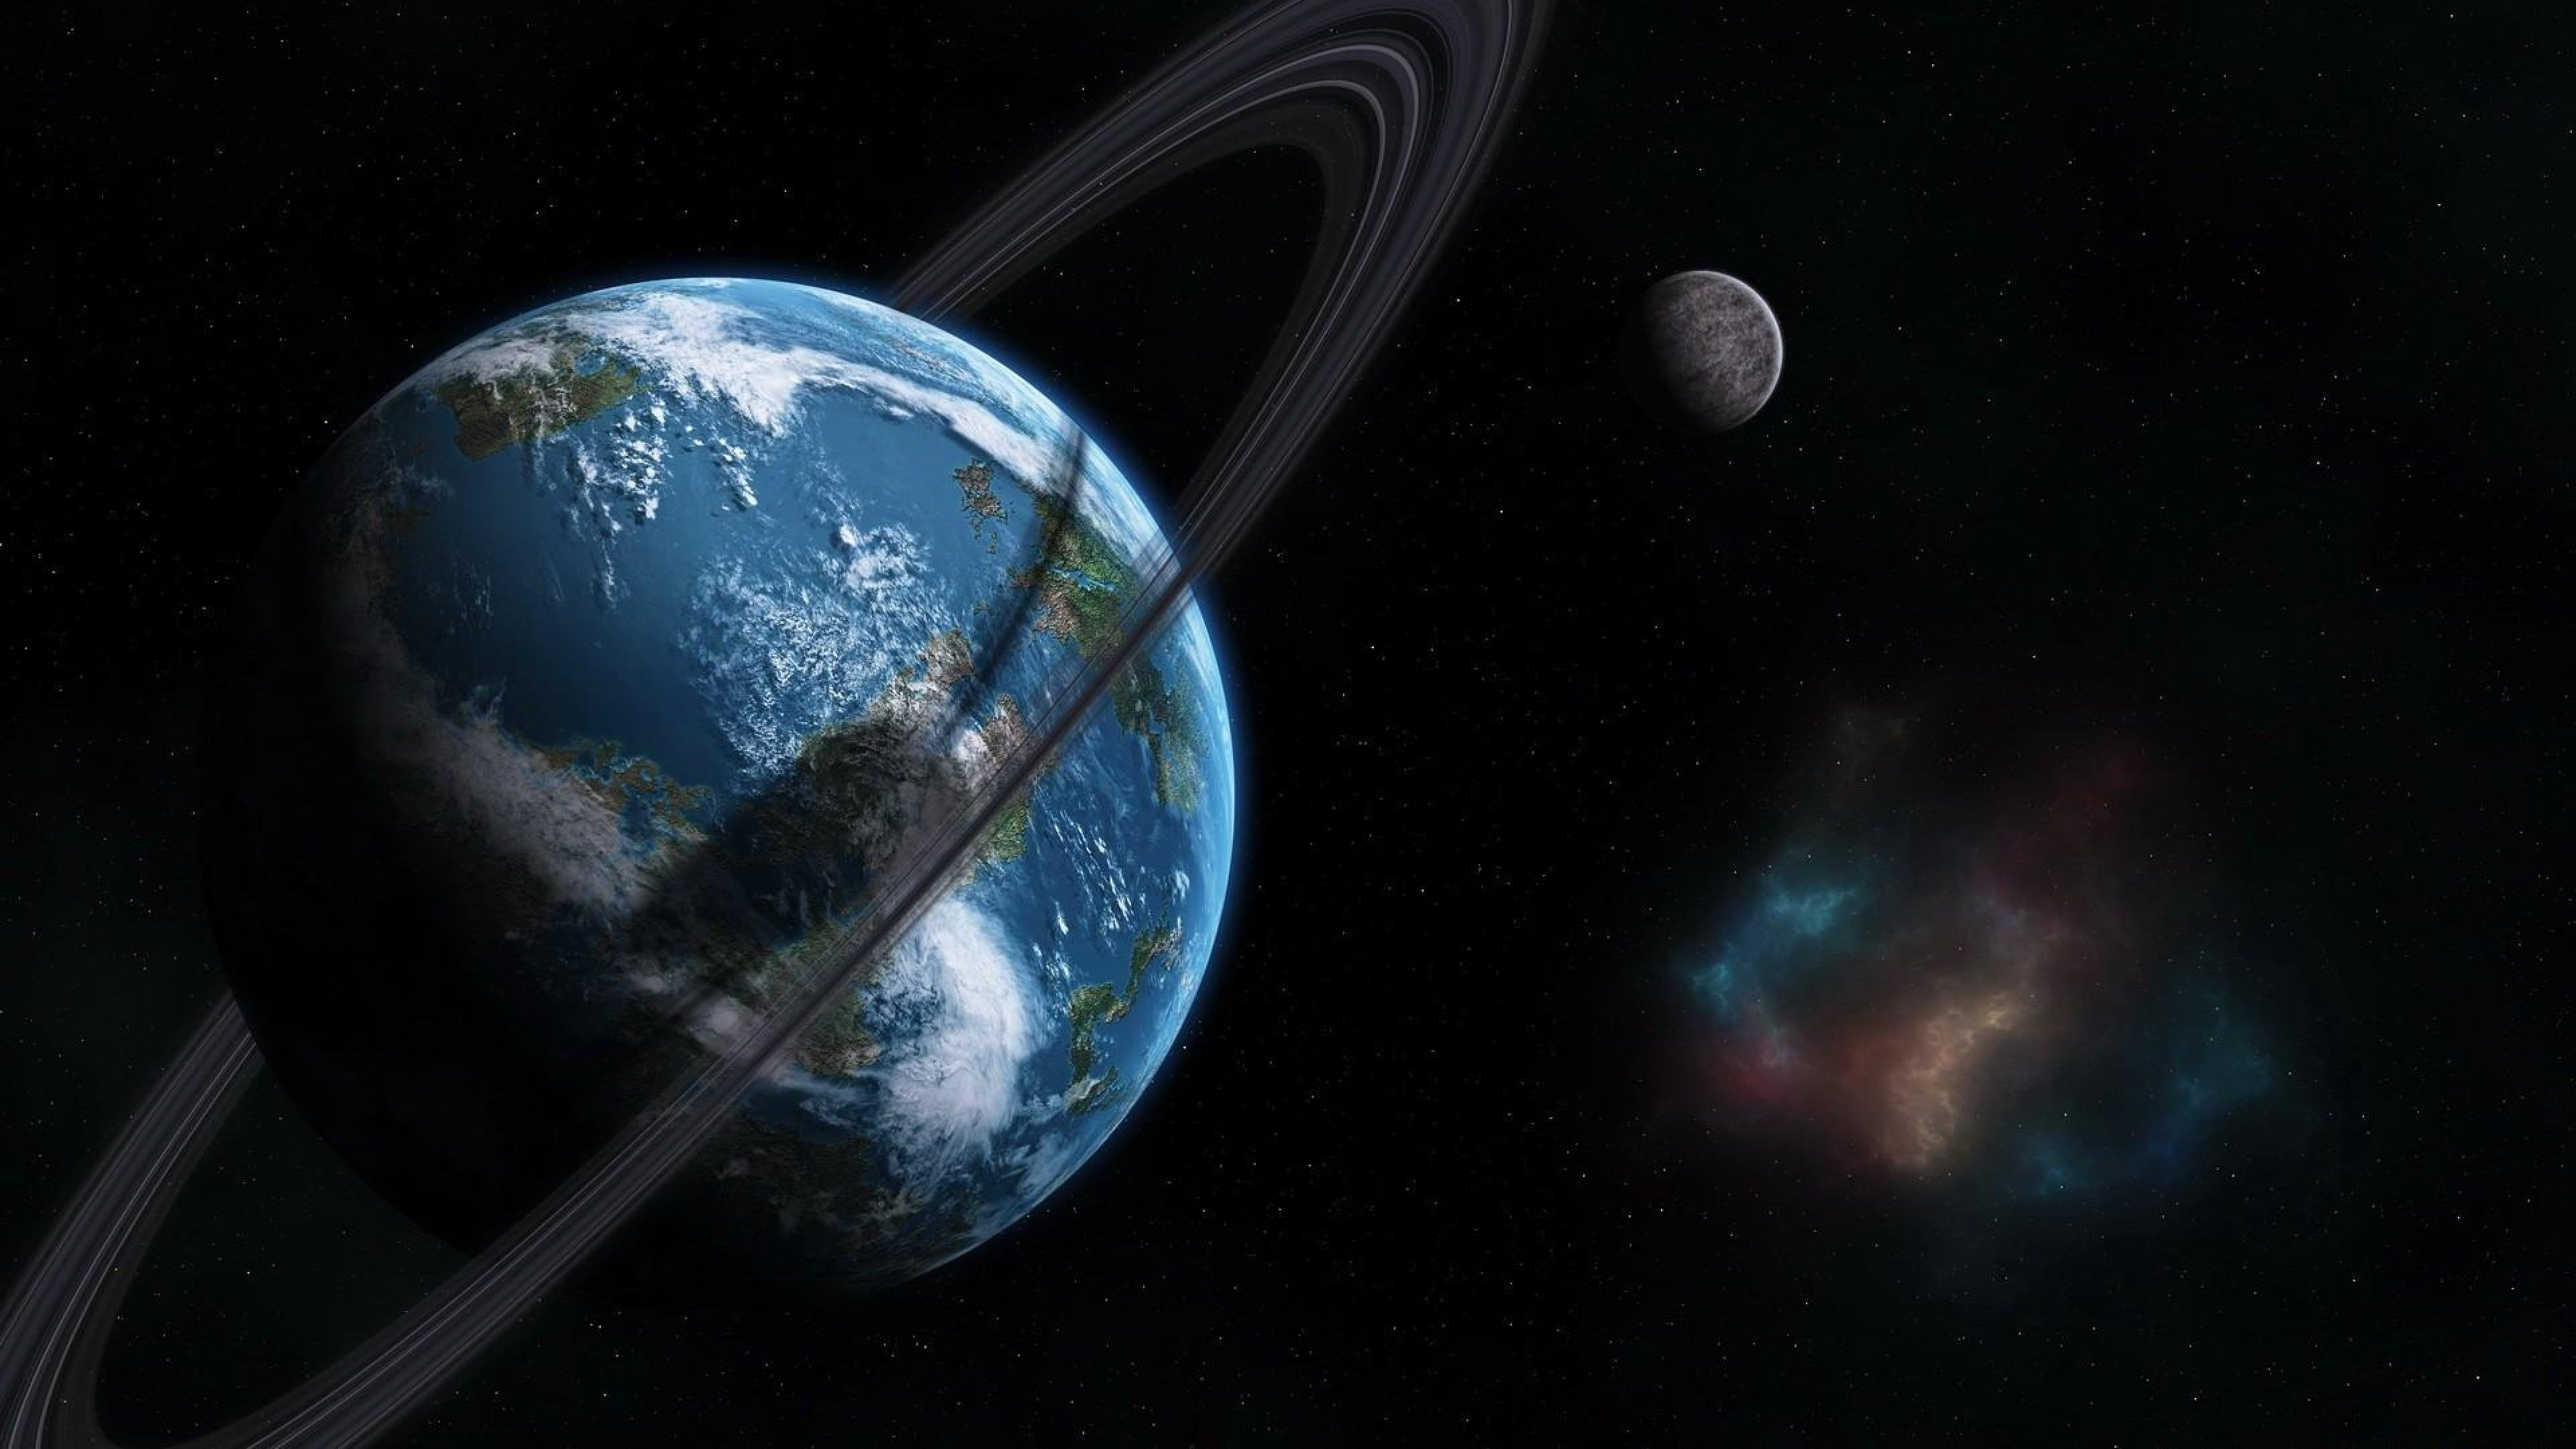 earth orbit between earth and space 4k ultra hd wallpaper …